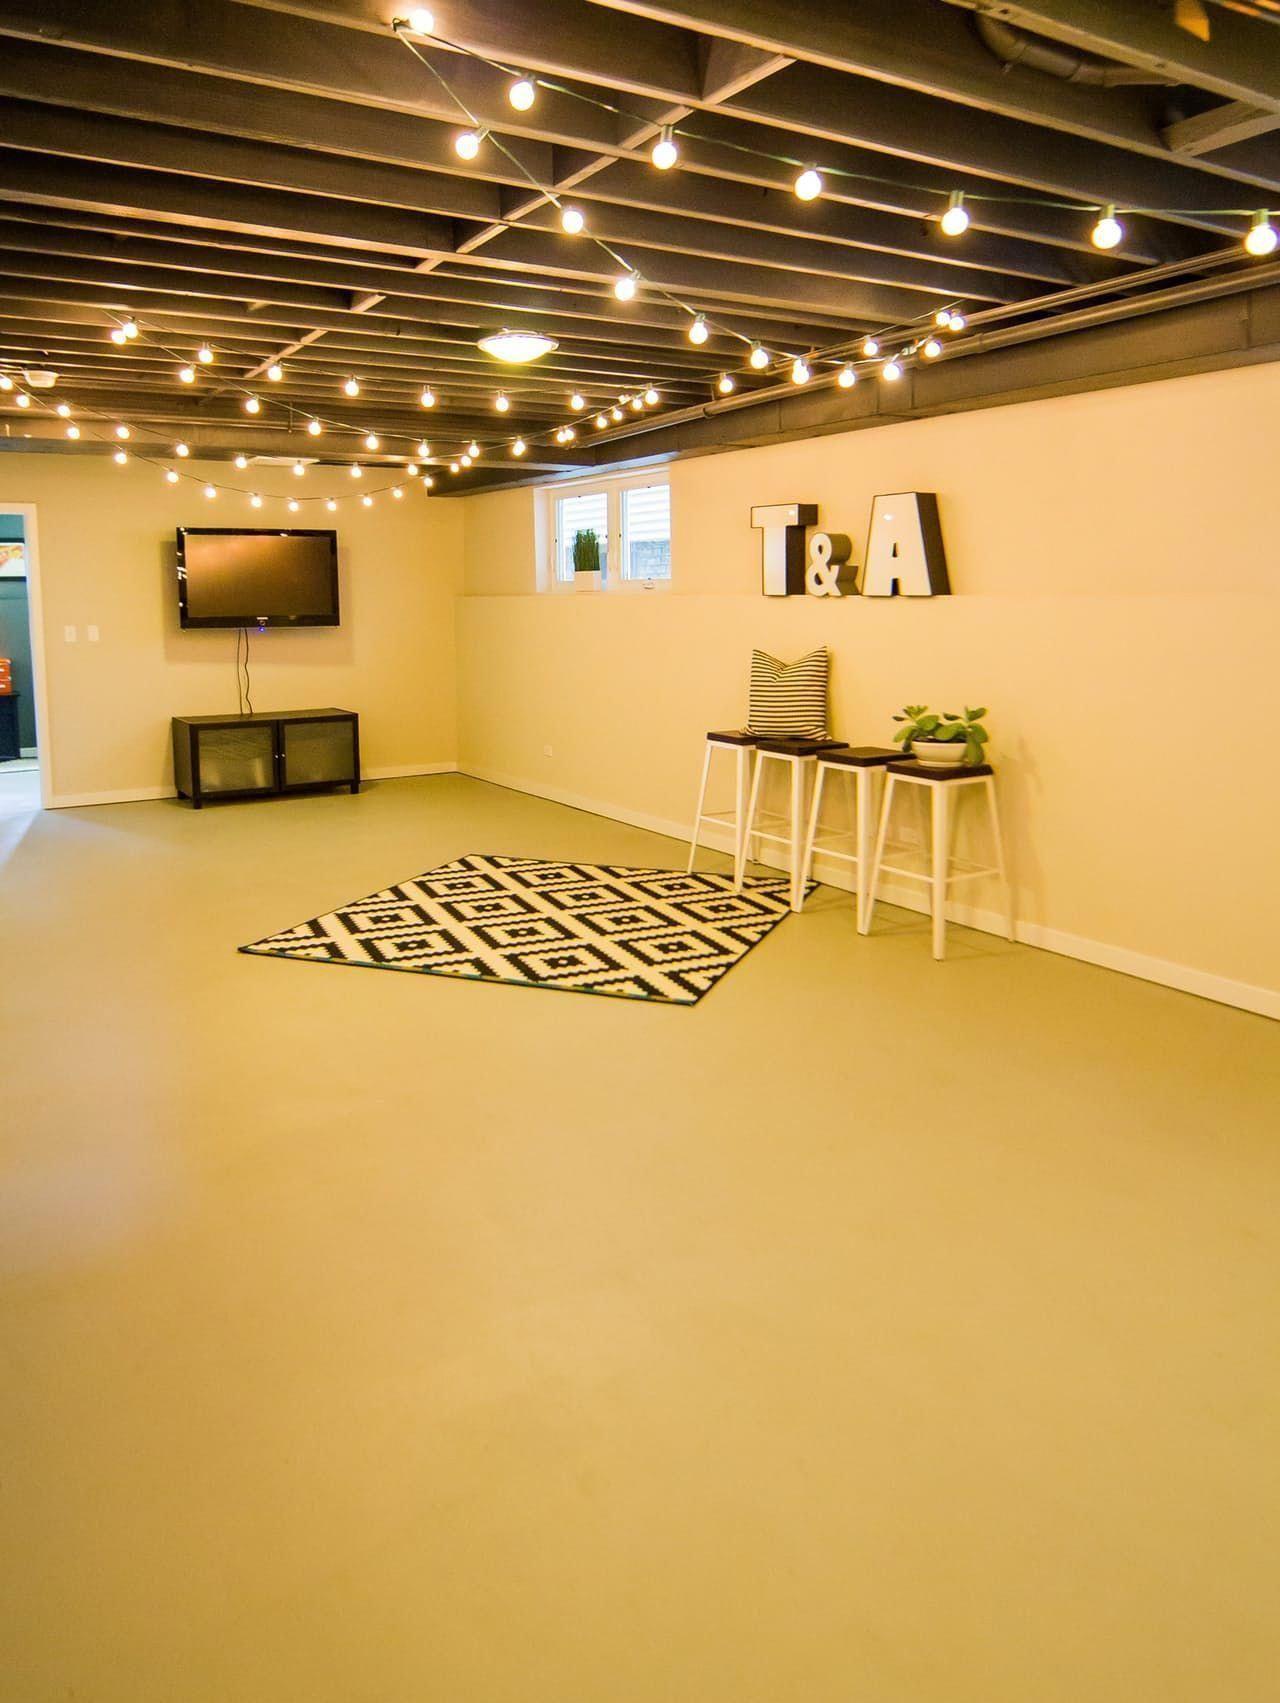 basement gym #basementremodelmancave #basementbathroomremodel